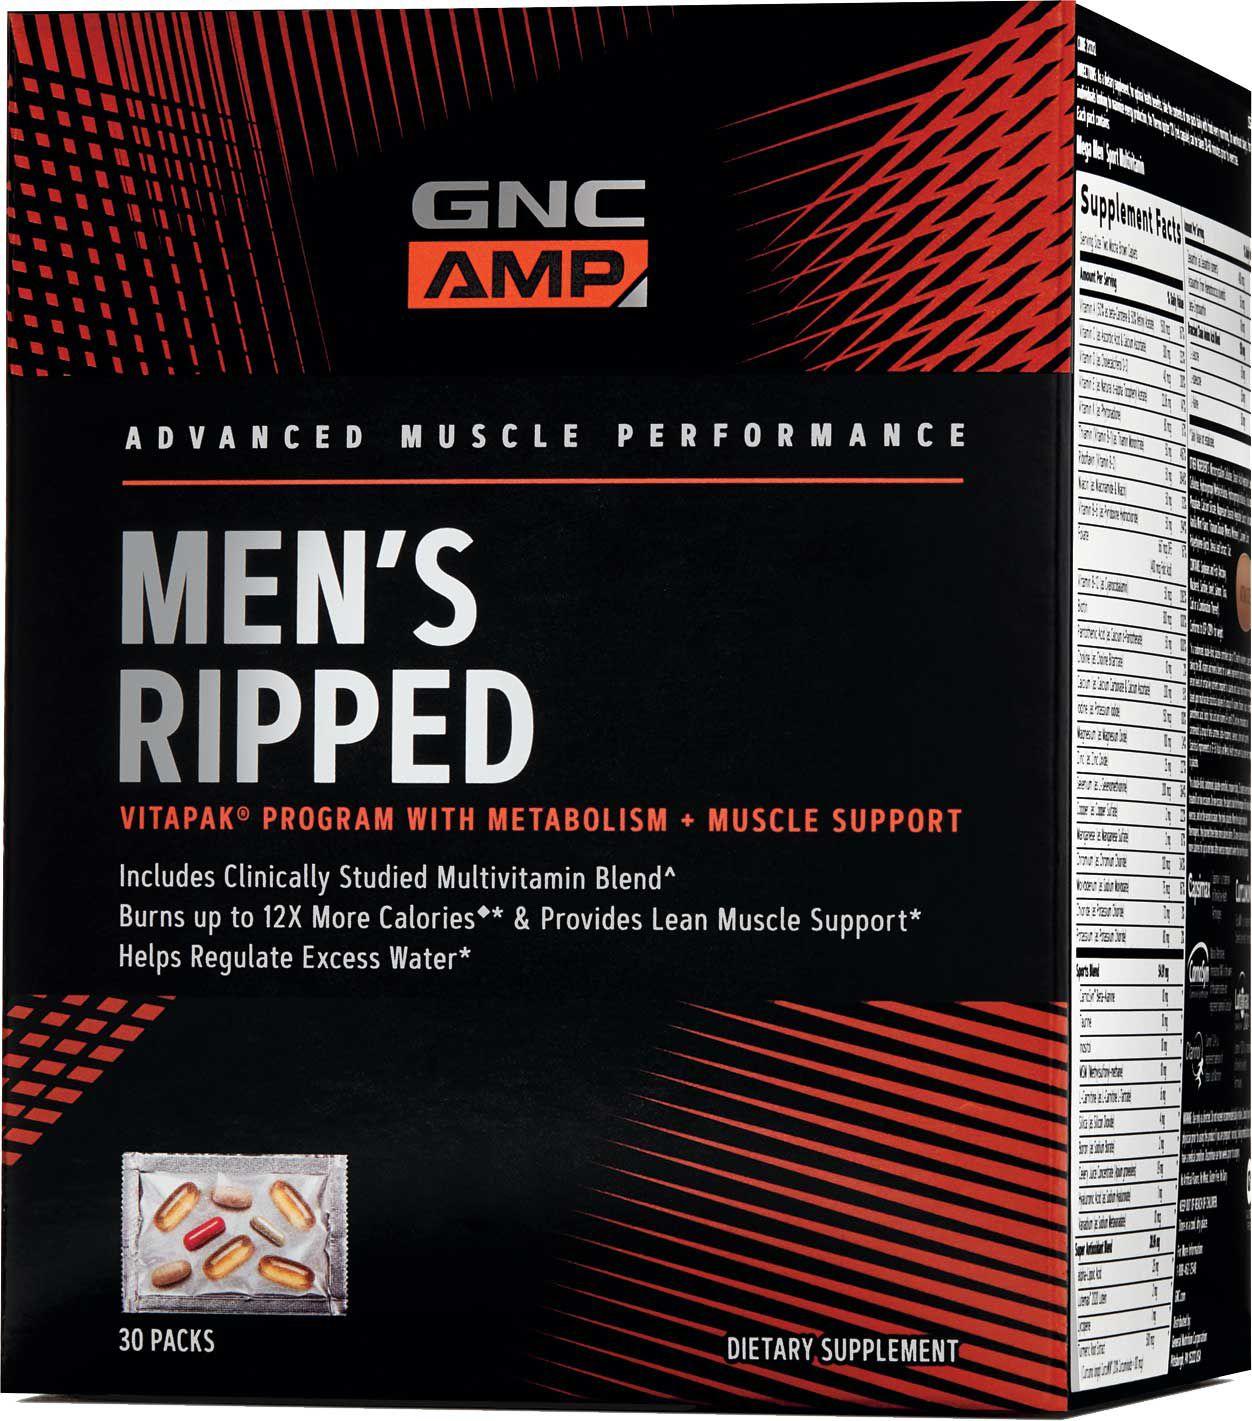 Gnc Amp Mens Ripped Vitapak Program - 30 Packs